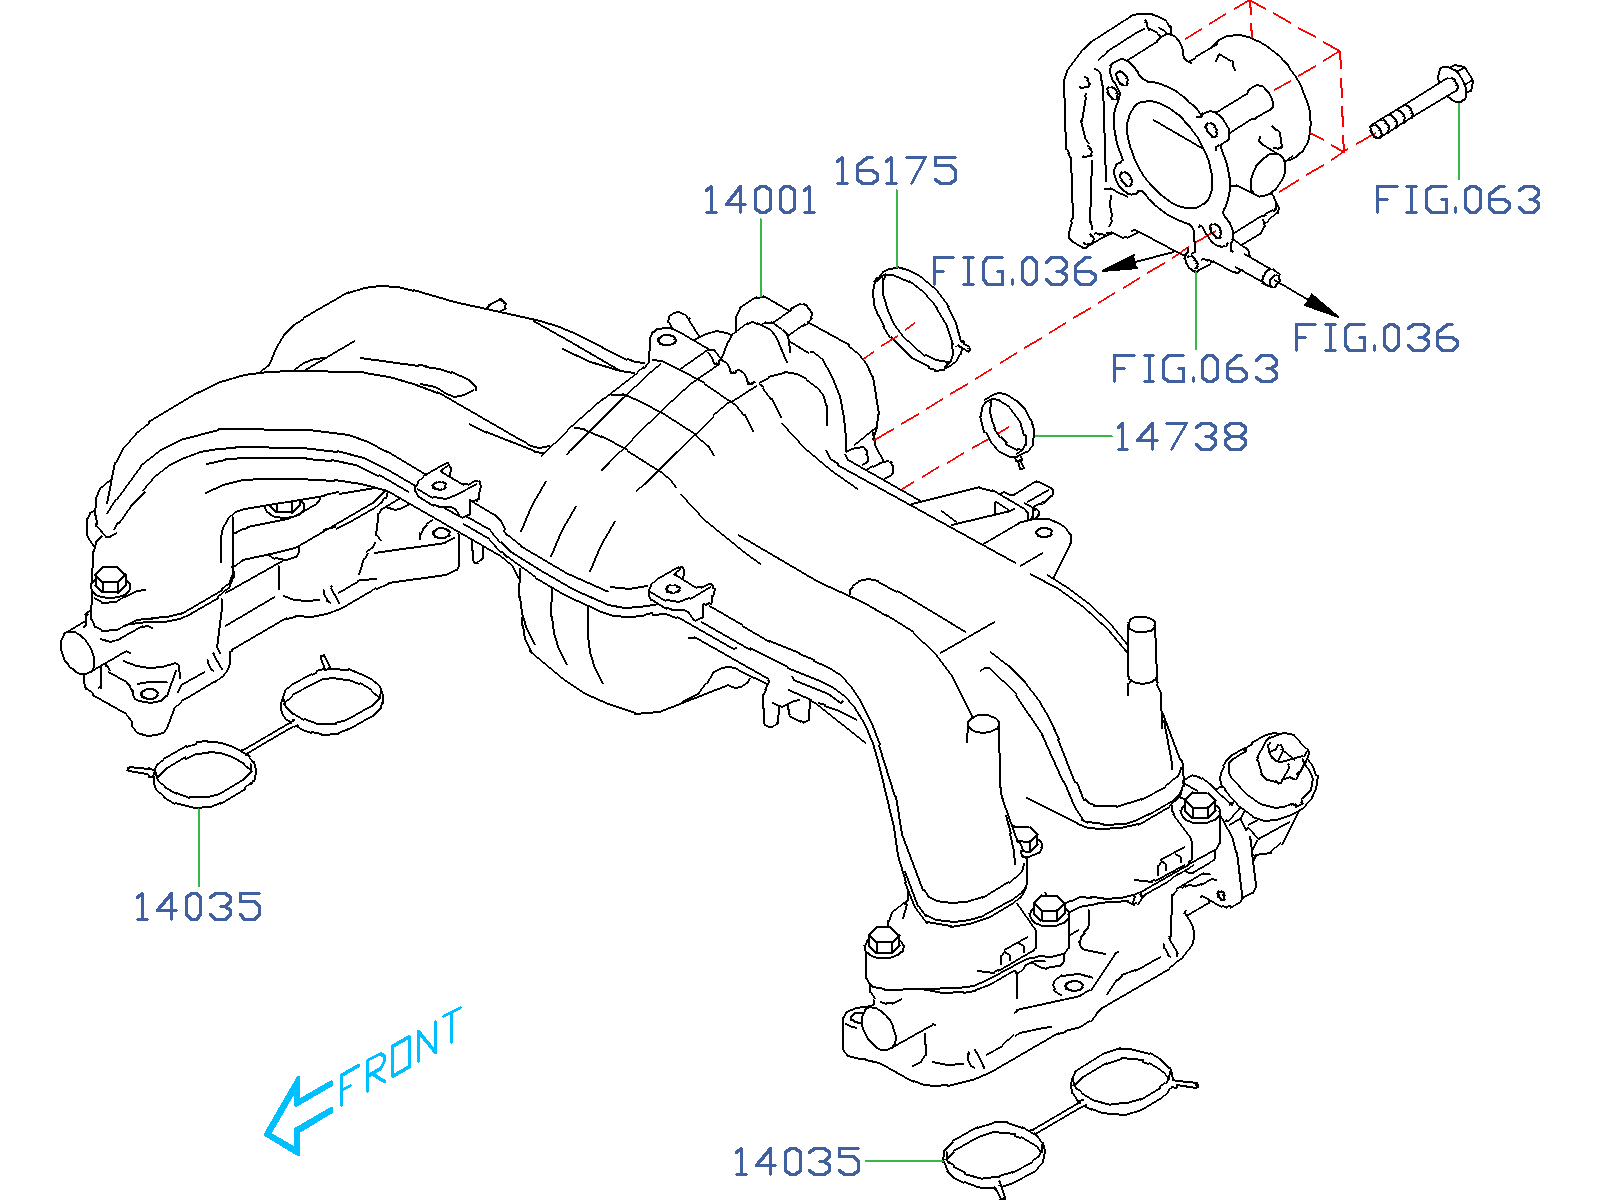 14035aa620 - gasket-intake manifold  body  throttle  engine  cooling